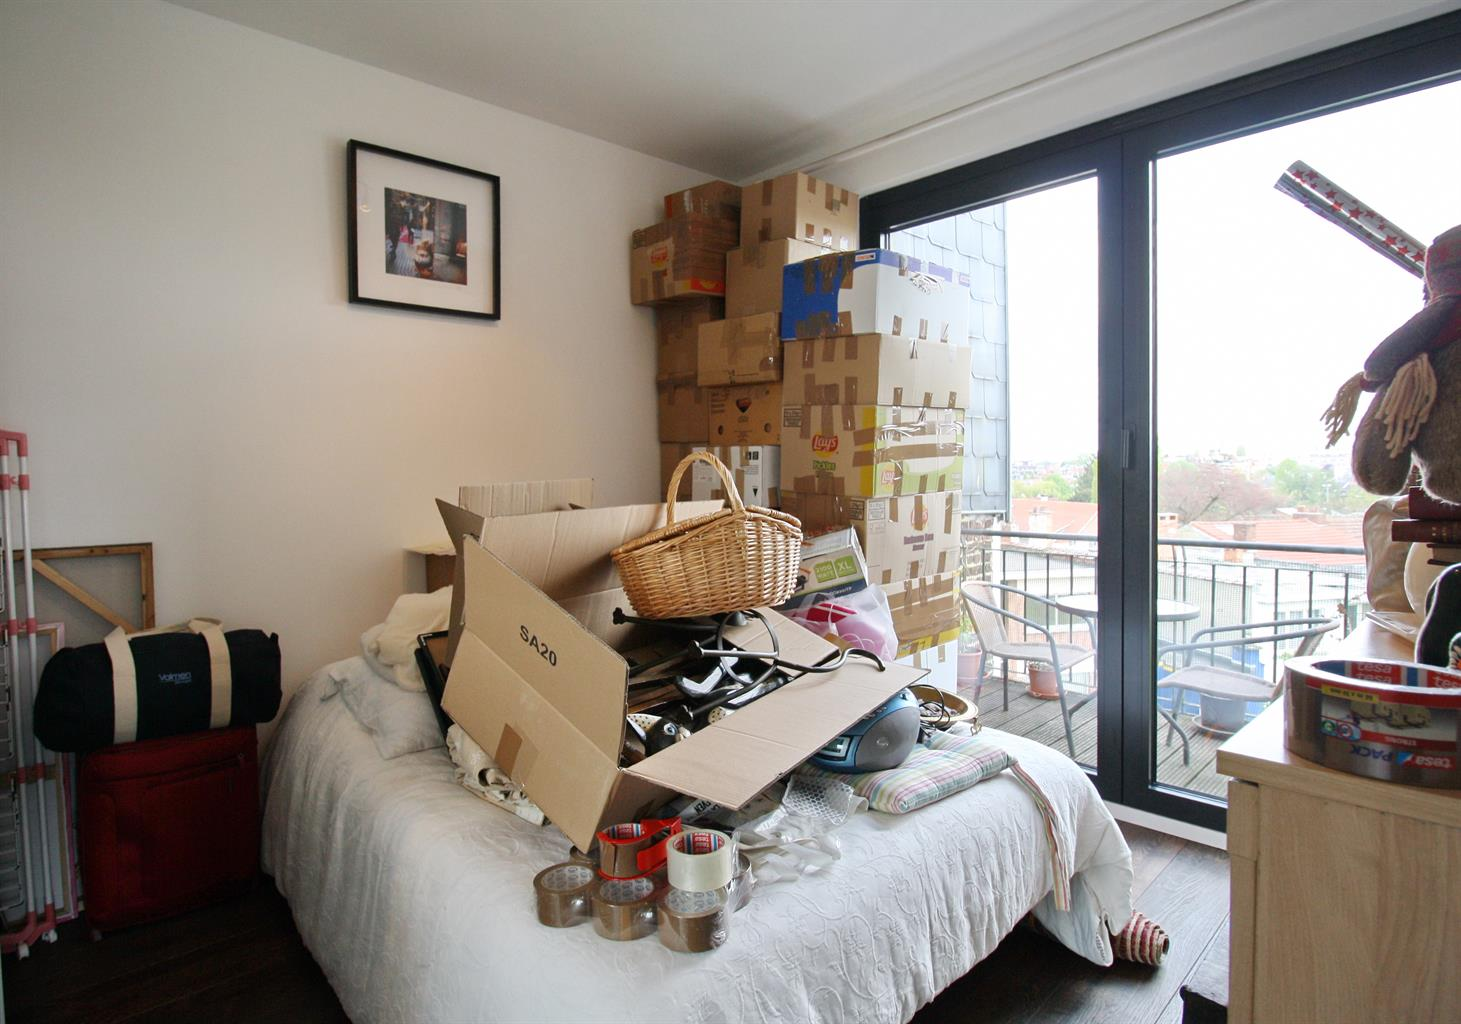 Penthouse - Berchem-Sainte-Agathe - #4346071-19